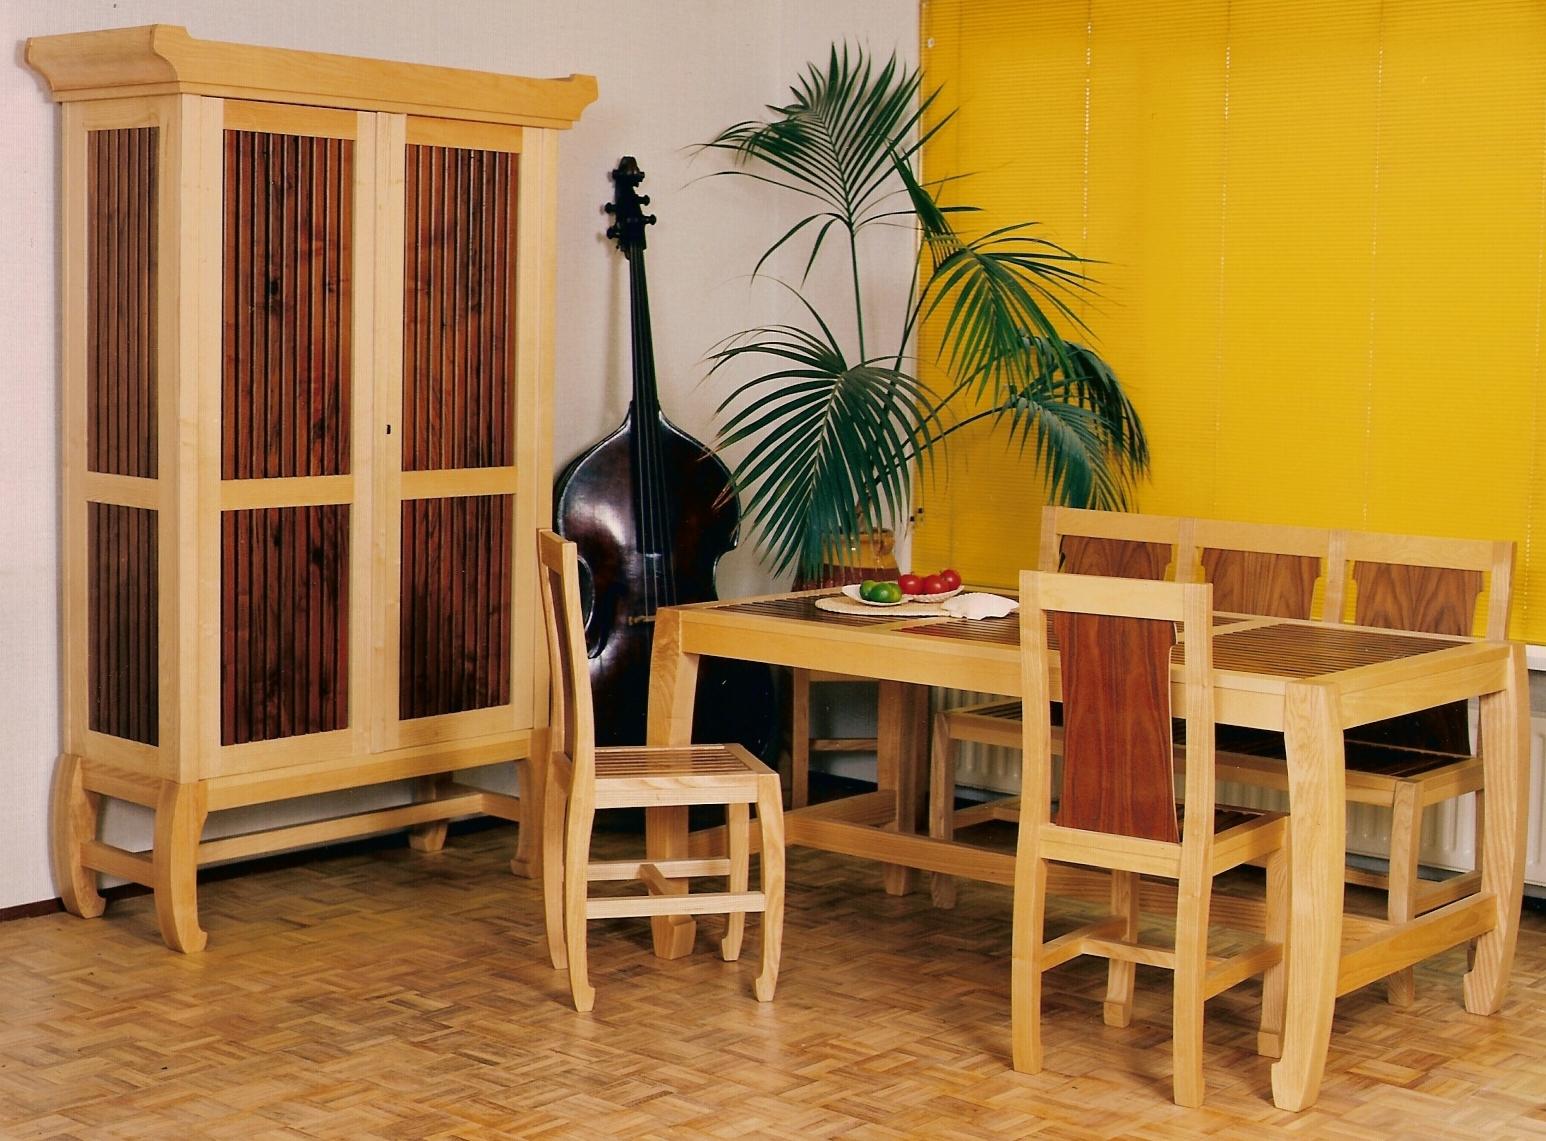 Tafels, stoelen, kast